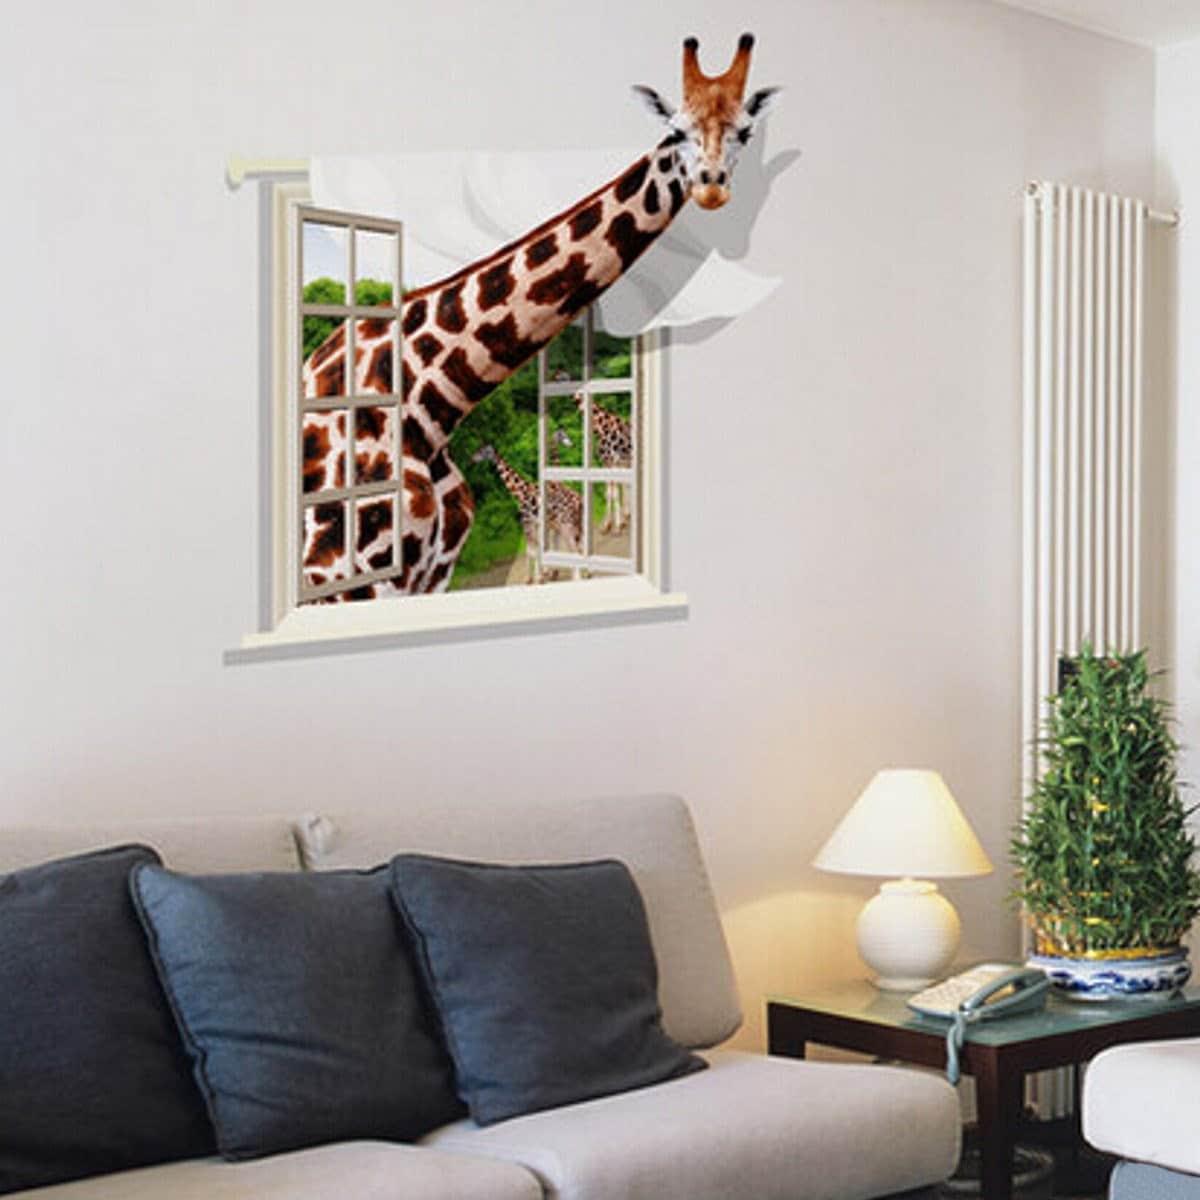 3D-рисунок жирафа